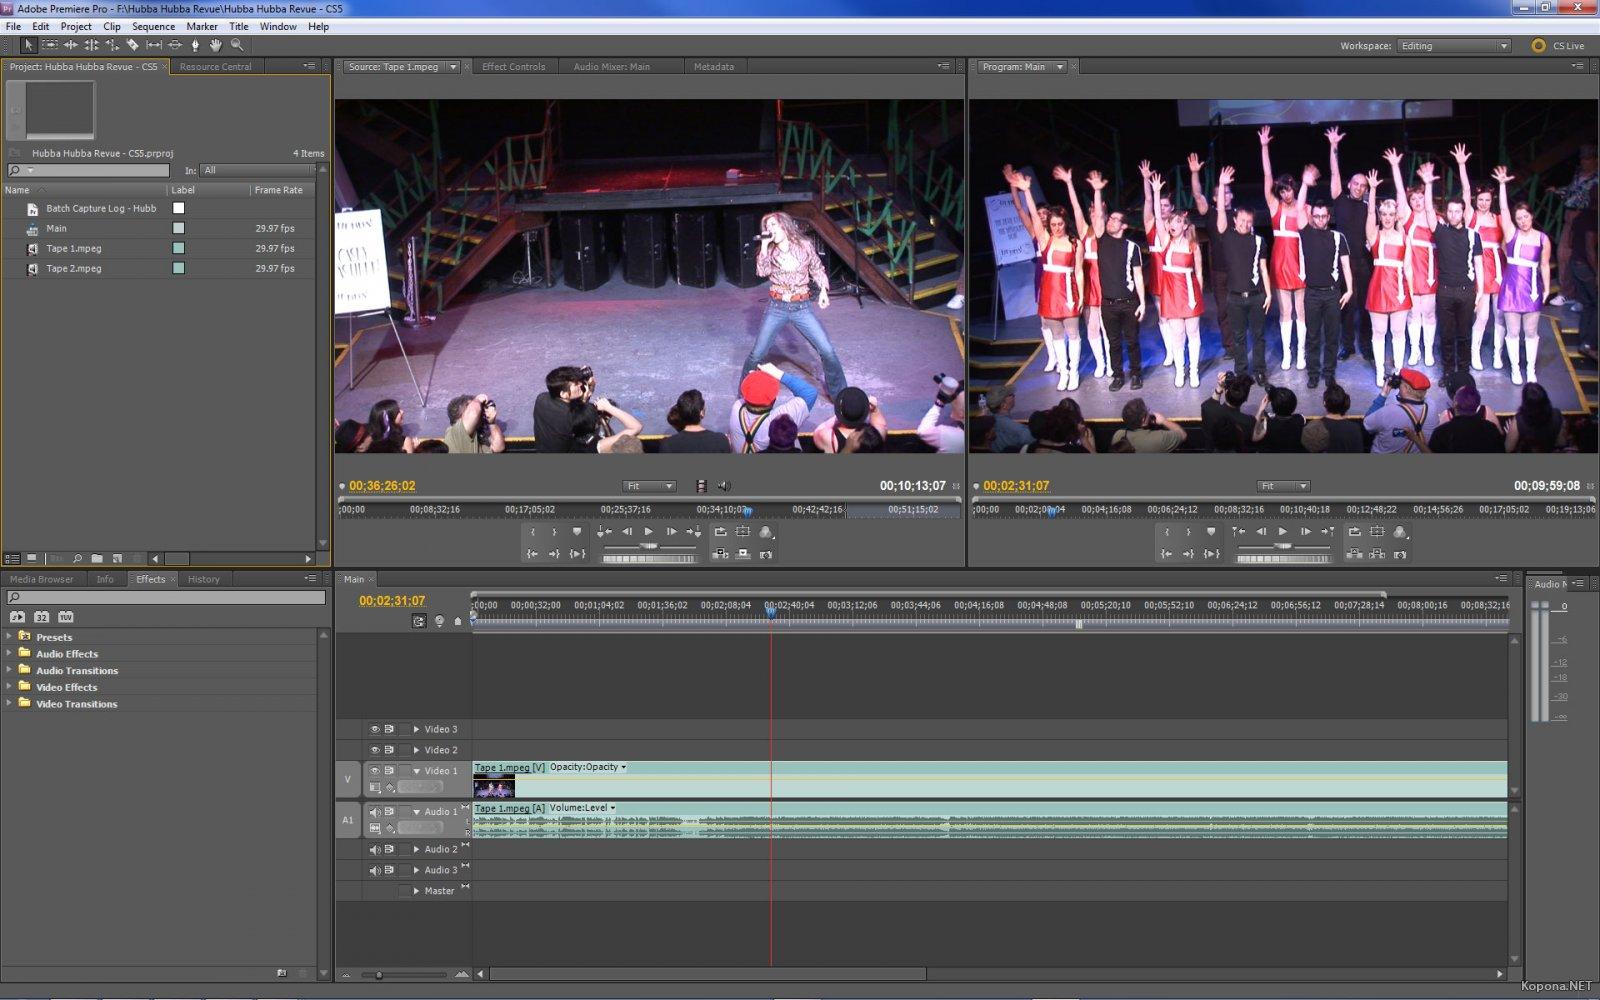 Adobe premiere pro cs5. 5 (5. 5. 2) eng\rus » pooshock. Ru сборки.